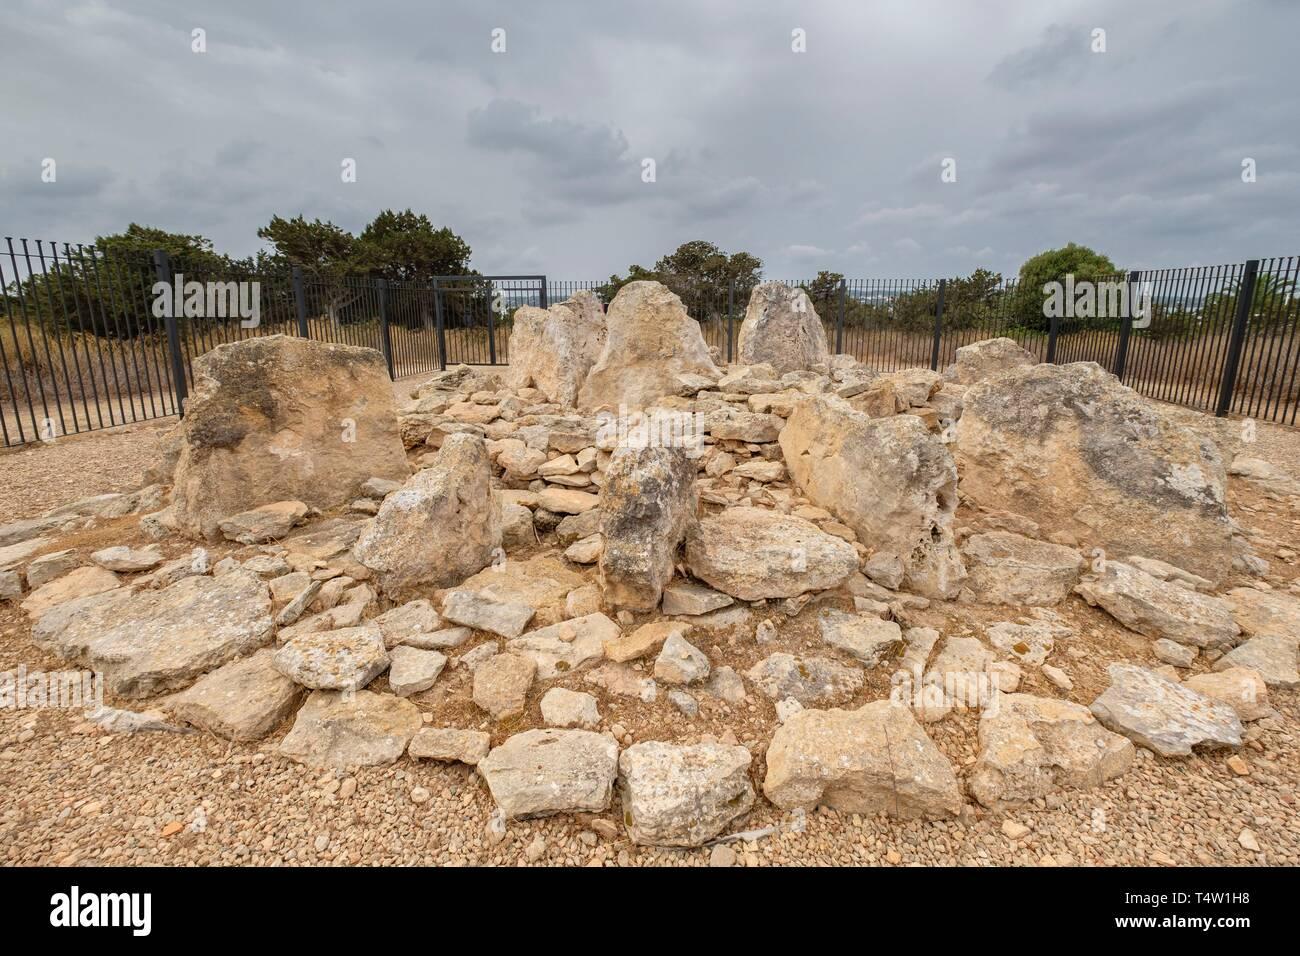 monumento megalítico , Ca Na Costa , 2.000 - 1.600 aC. a, comienzos de la edad de bronce, Formentera, balearic islands, Spain. - Stock Image